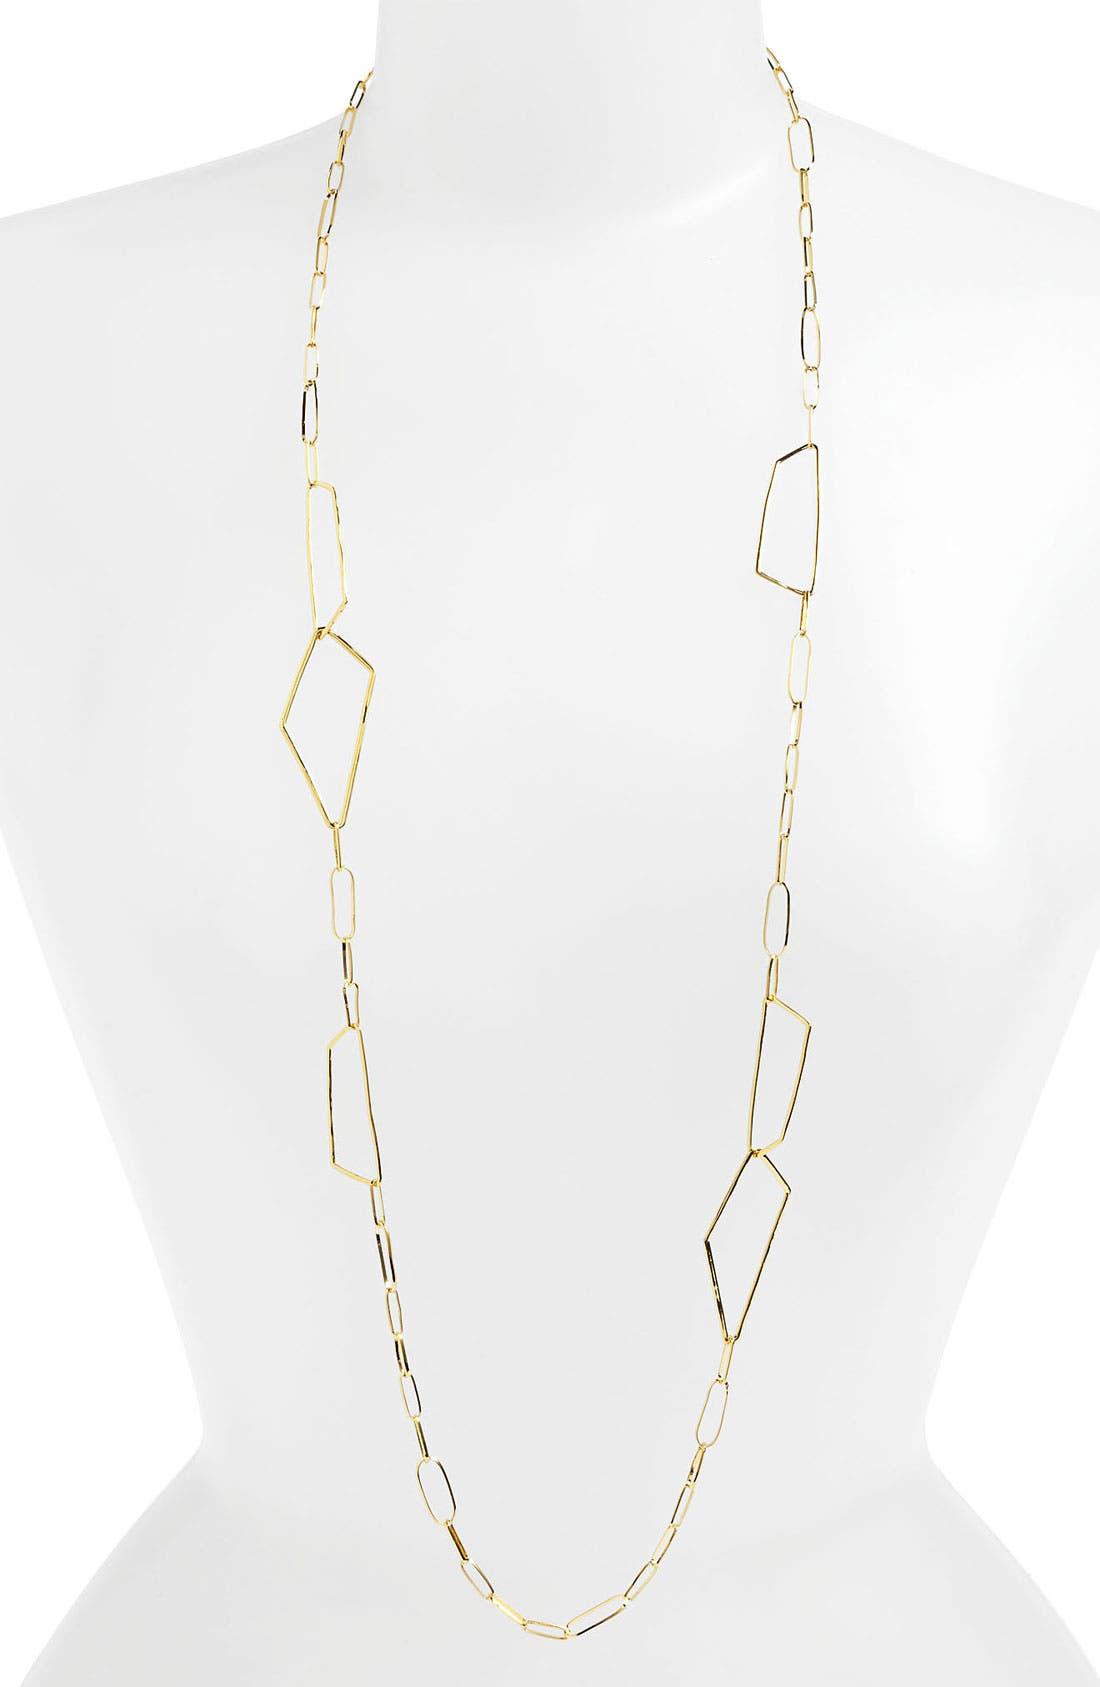 Main Image - Alexis Bittar 'Miss Havisham - New Wave' Long Link Necklace